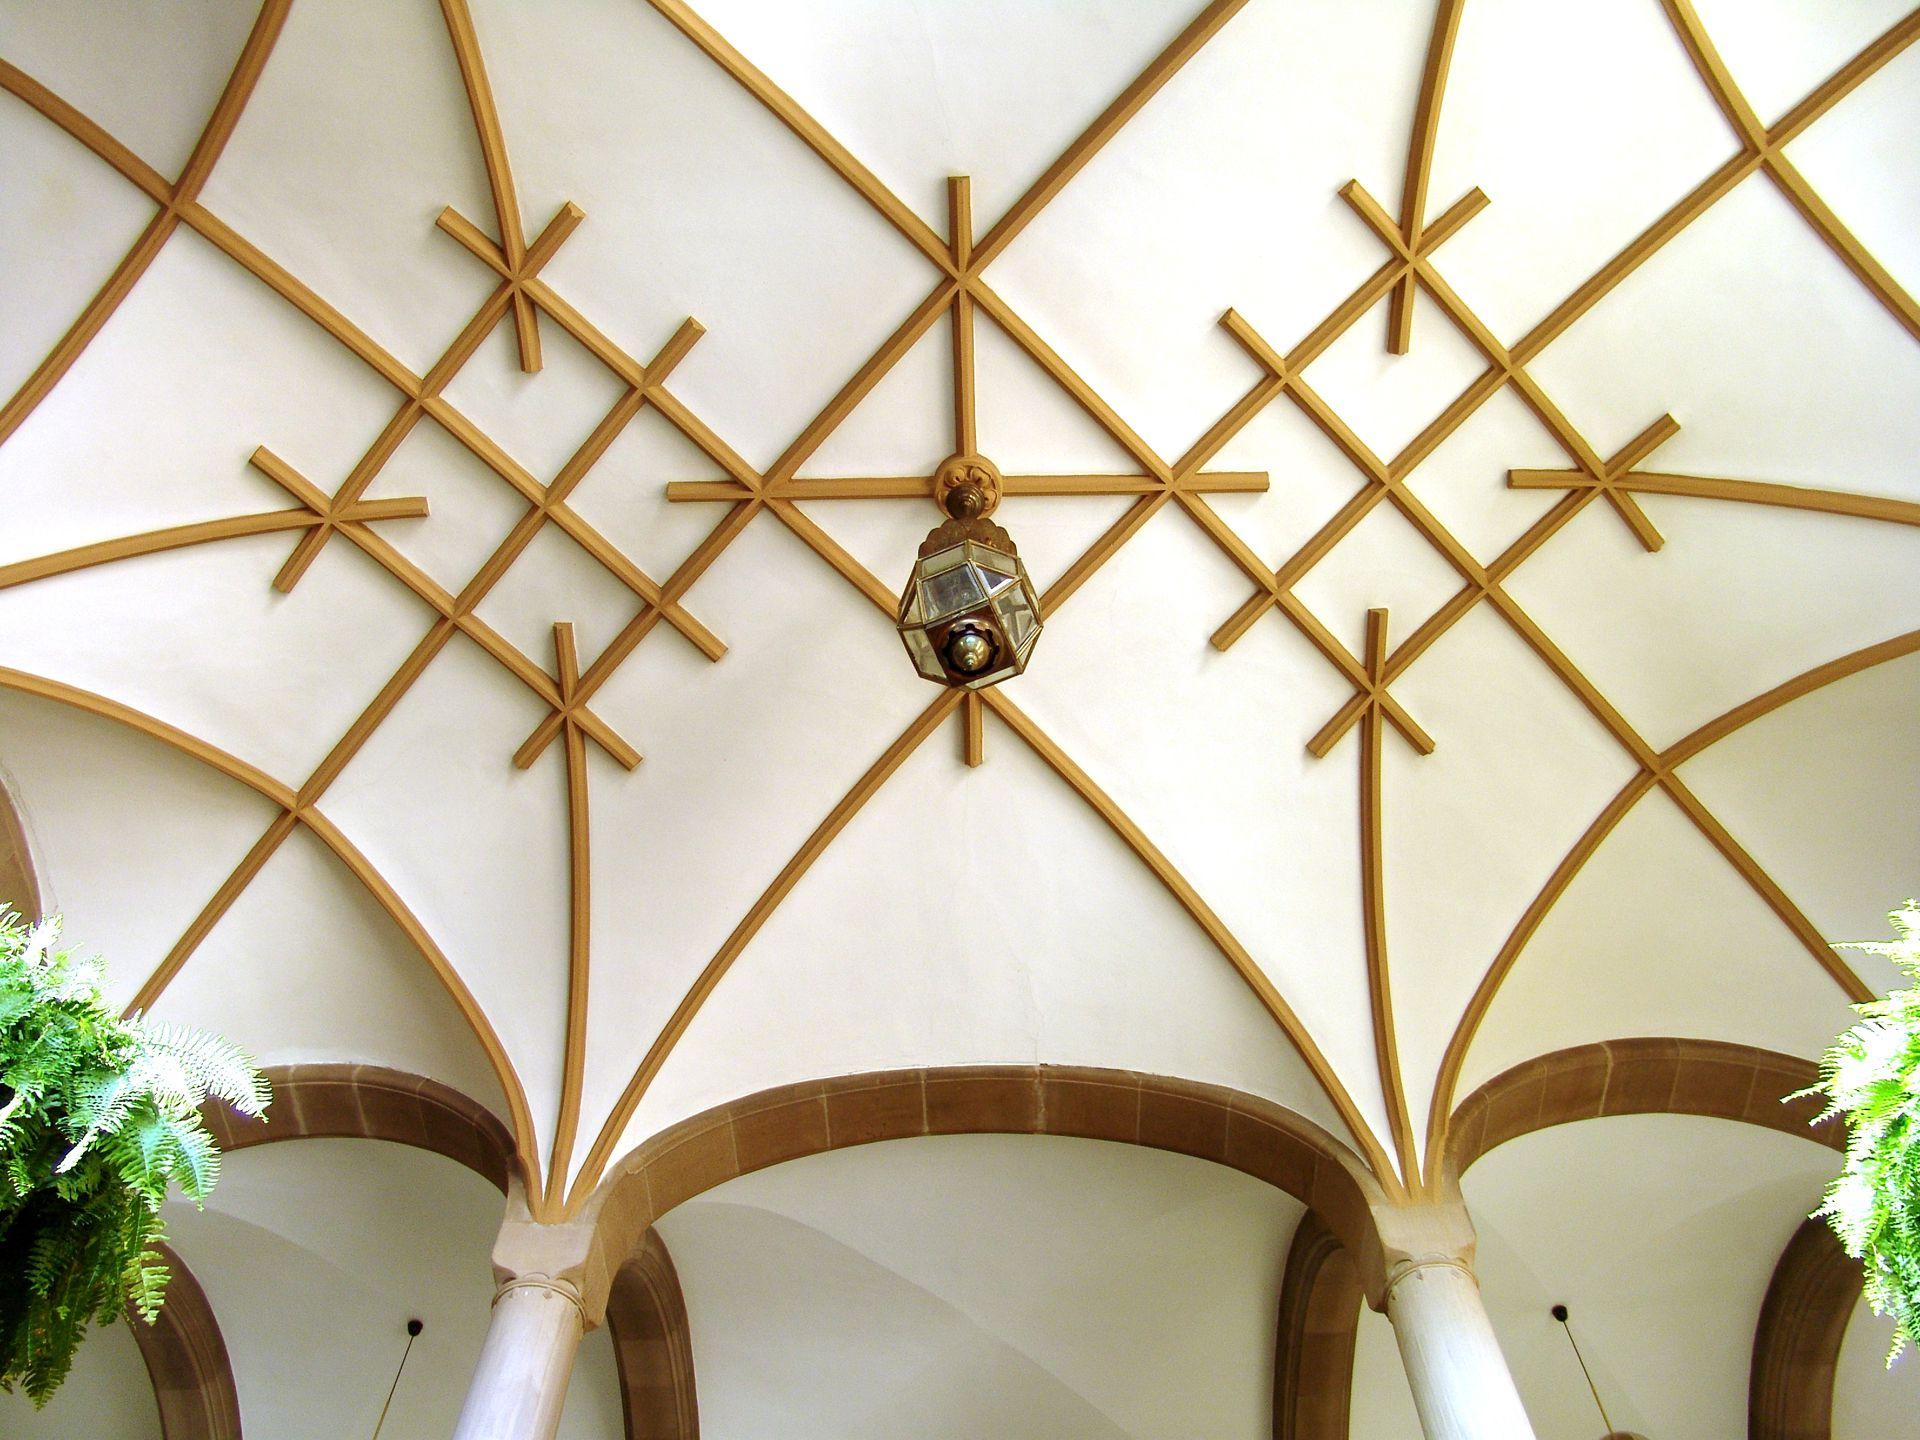 Sozialgericht Rippengewölbe des Treppenhauses